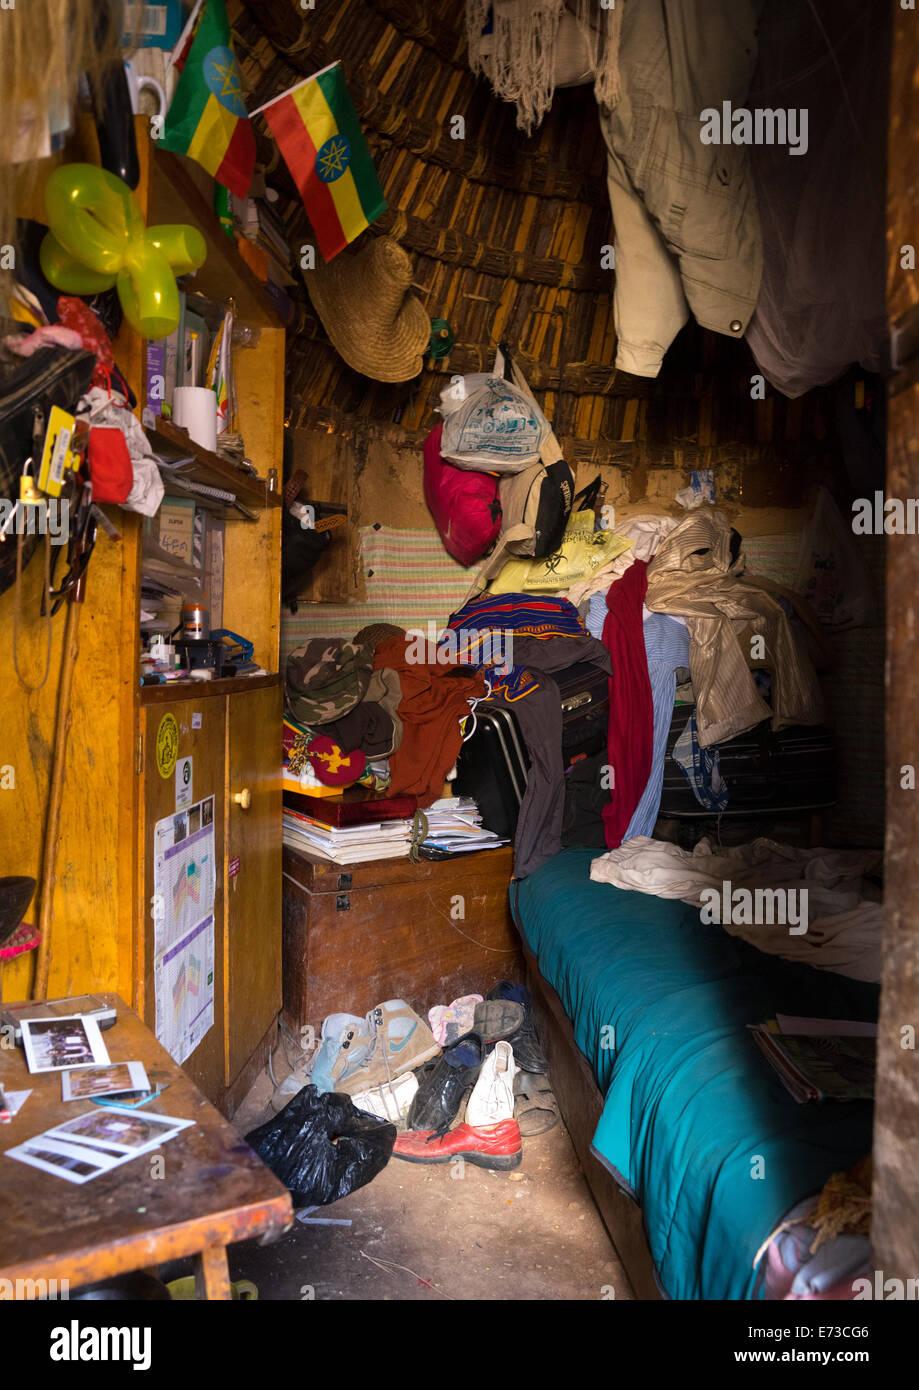 Poqla Kalla Gezahegn Woldedawit Konso King Hut, Konso, Ethiopia - Stock Image